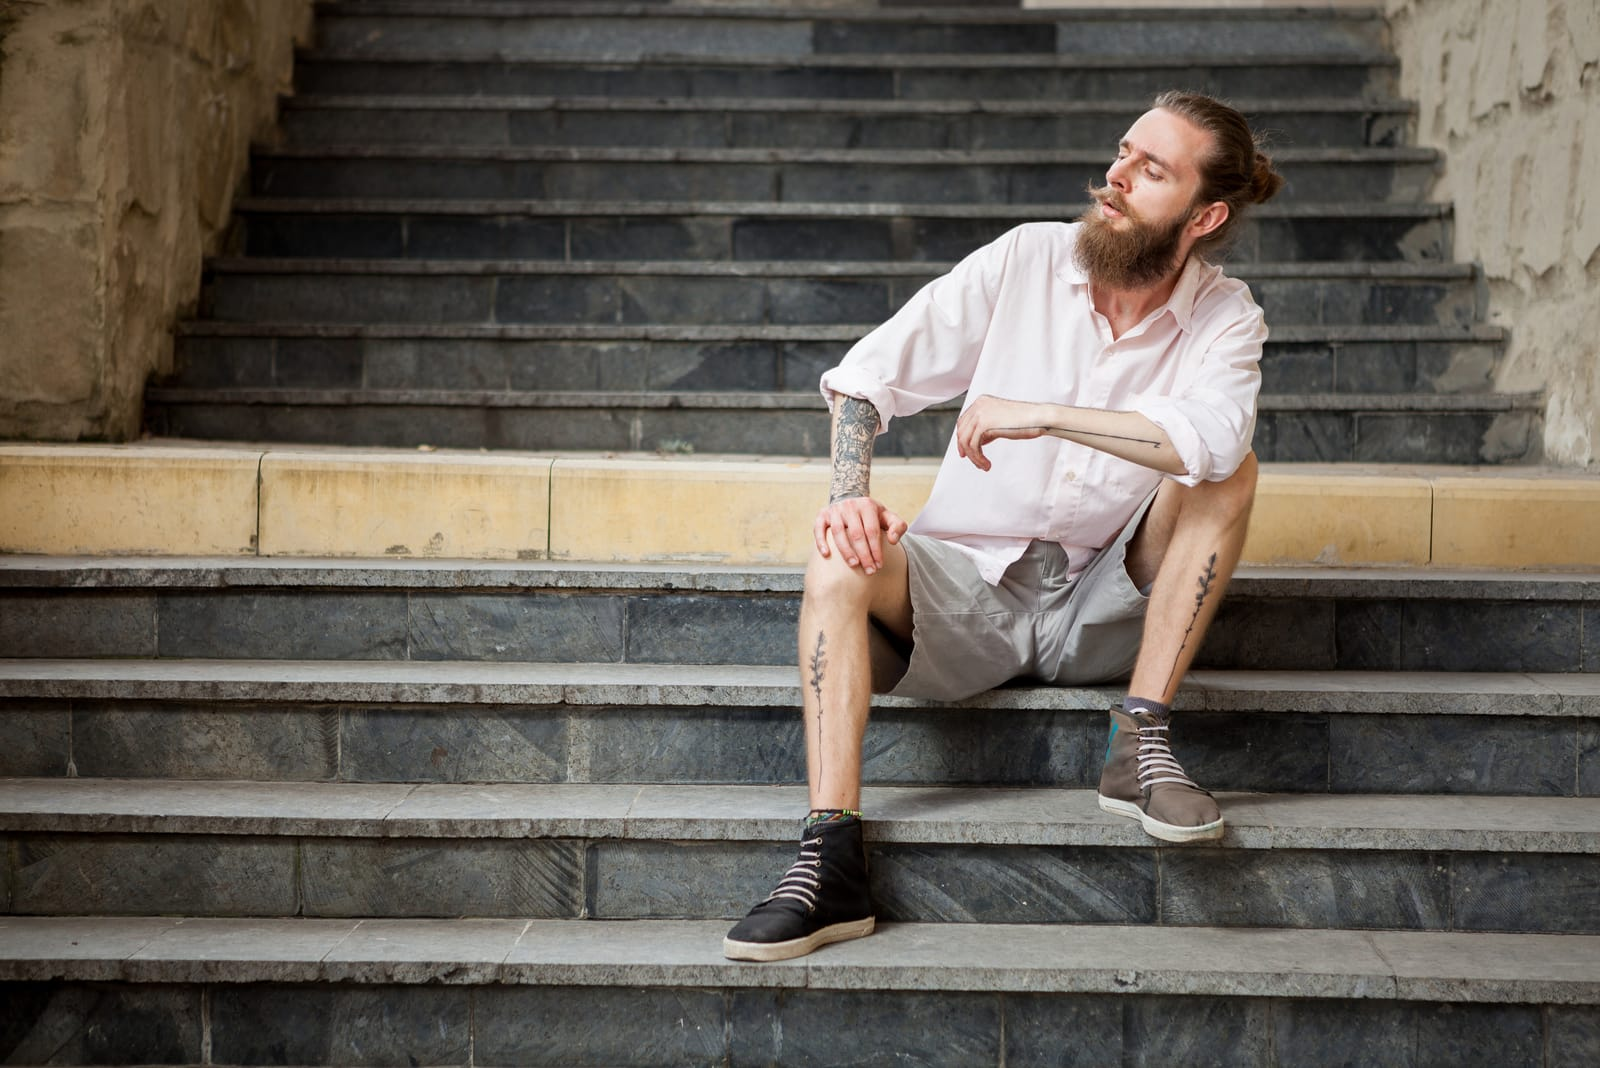 tattooed man sitting on stairs